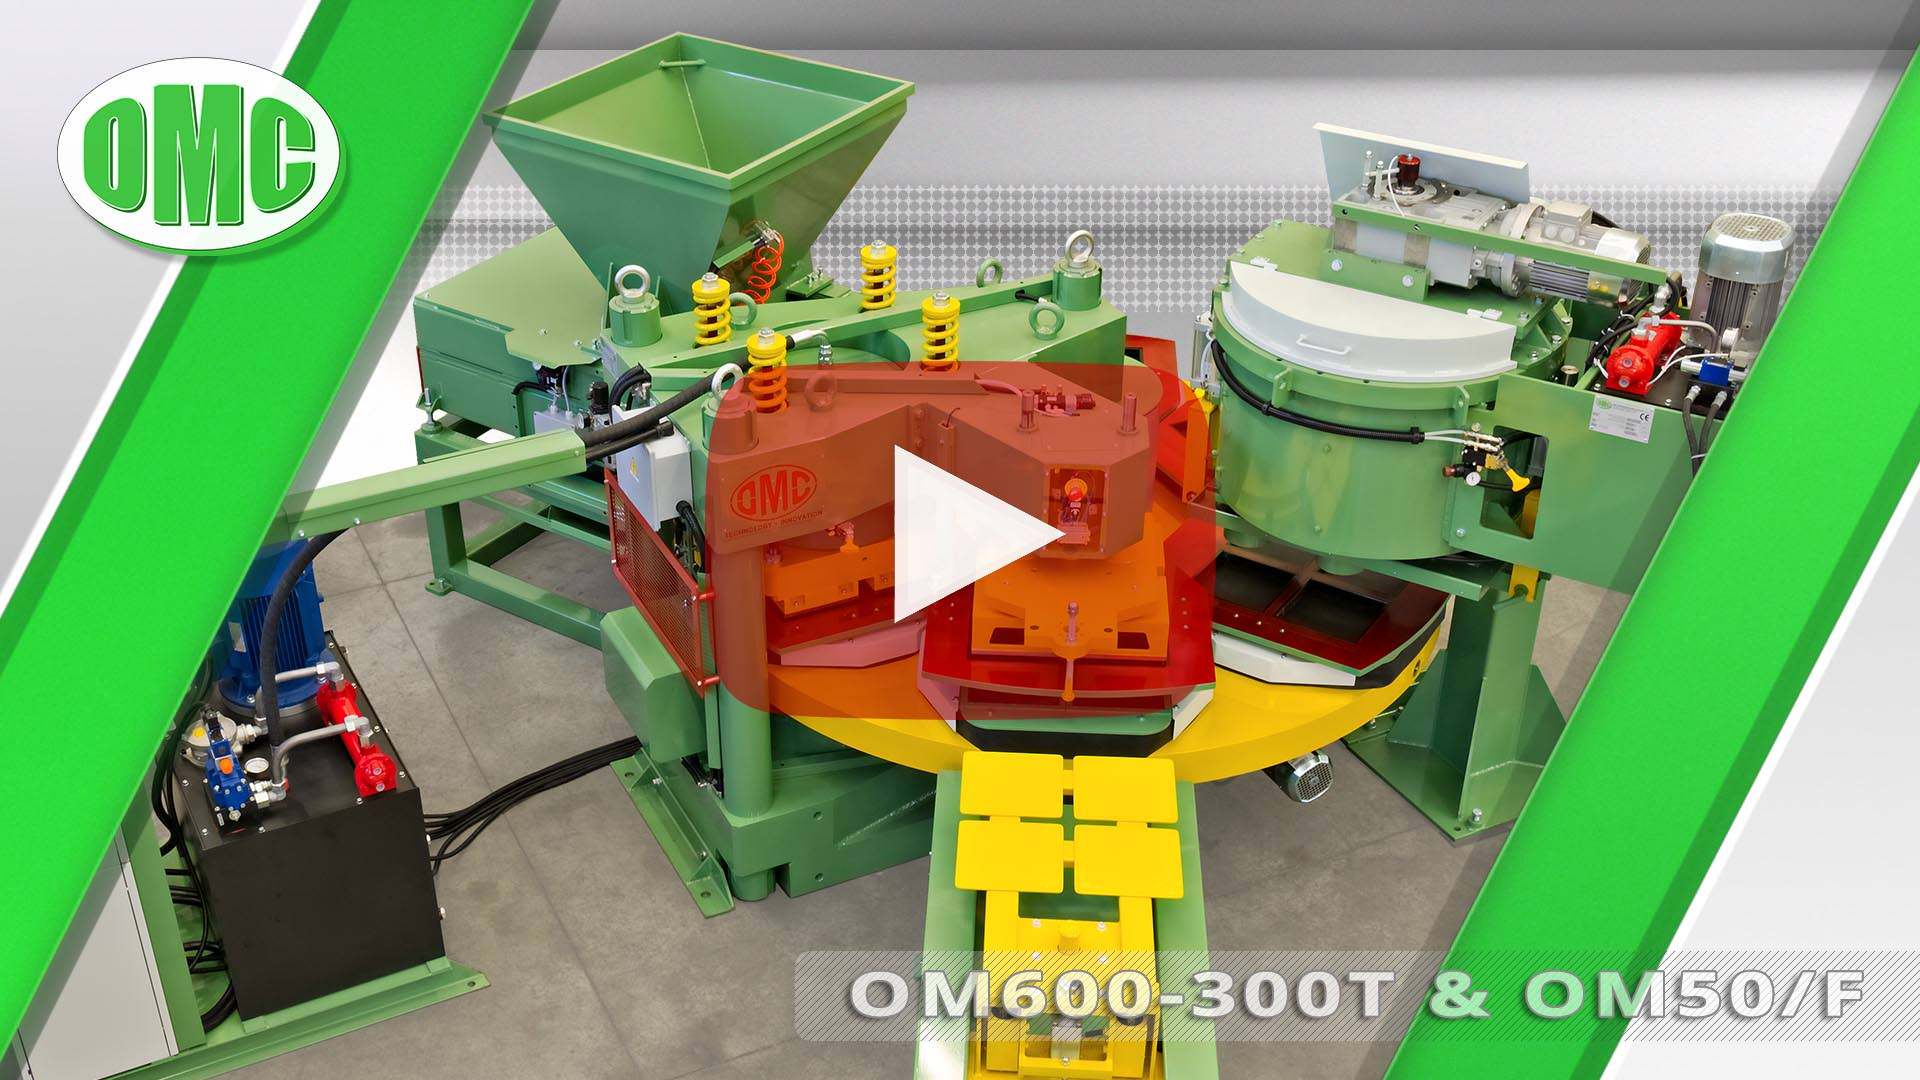 Pressa Rotativa Automatica Mod.OM600-300T con Mod. OM50/F (25x25x4)